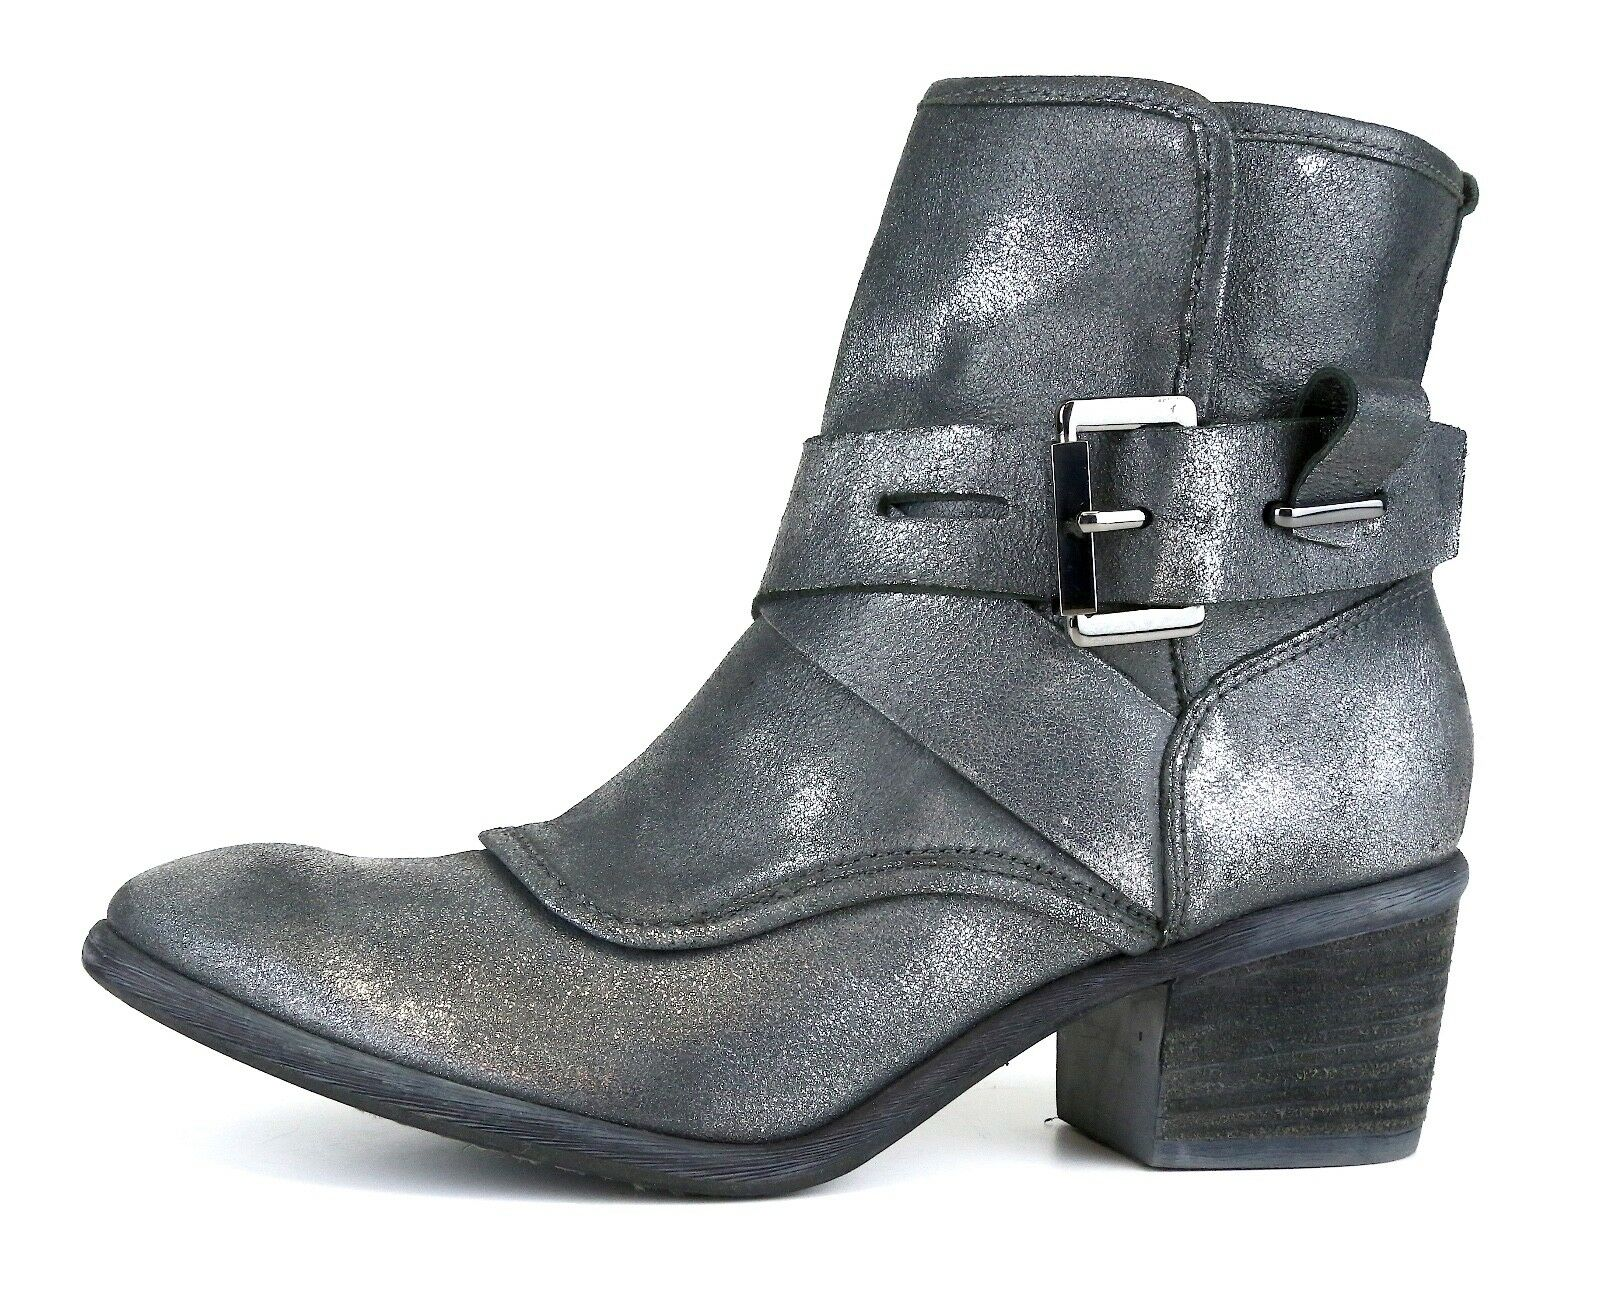 Donald J Pliner Diem Boot Metallic Women Sz 8.5 M 5071 *